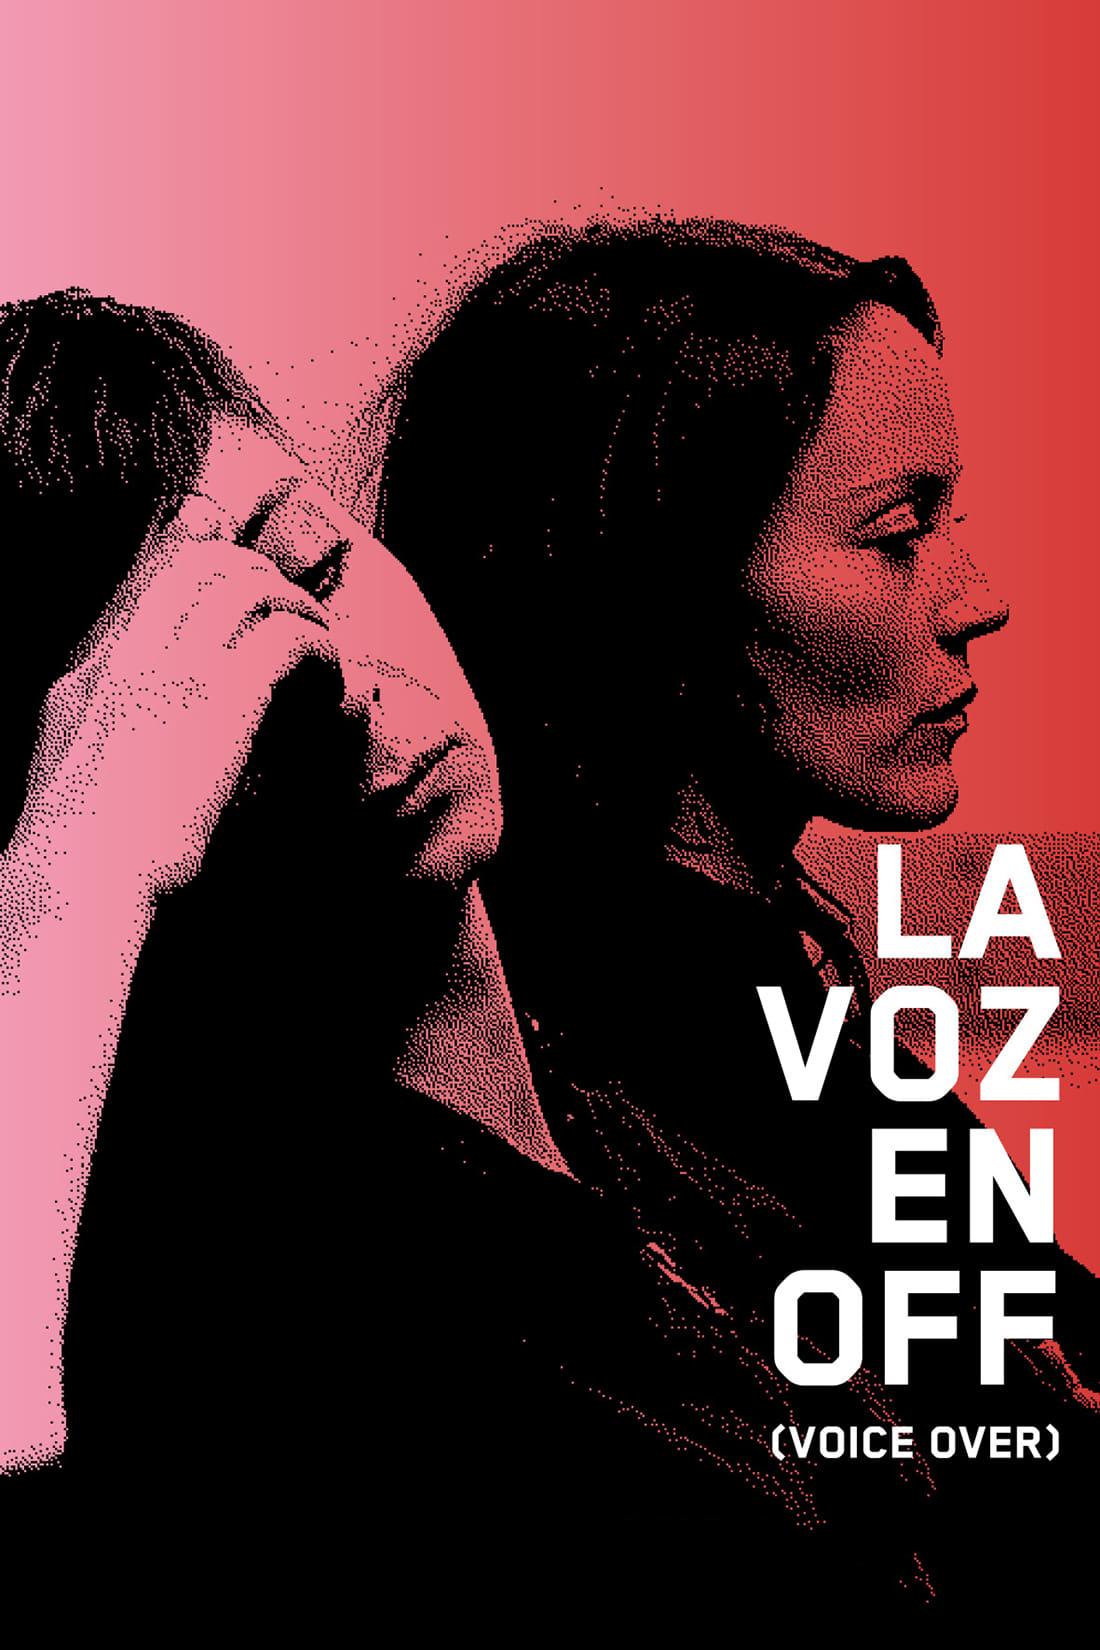 Voice Over (2014)